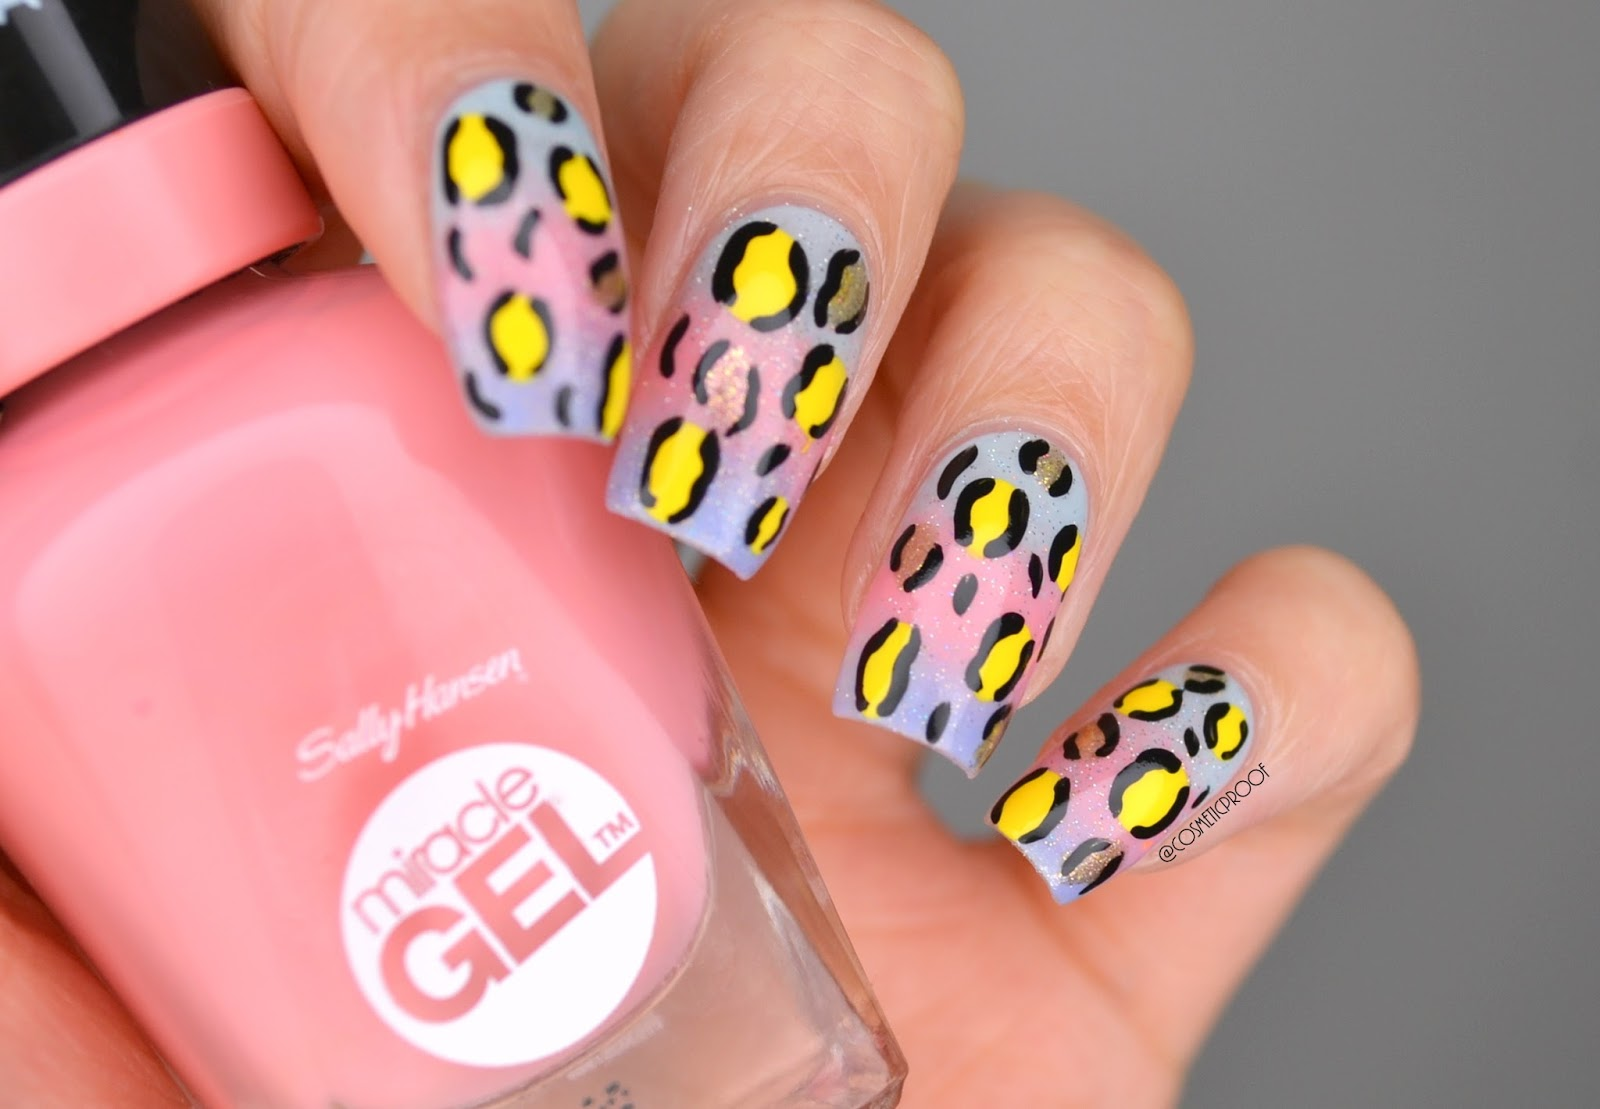 Nails Pastel Punk Leopard Print Cbbxmanimonday Cosmetic Proof